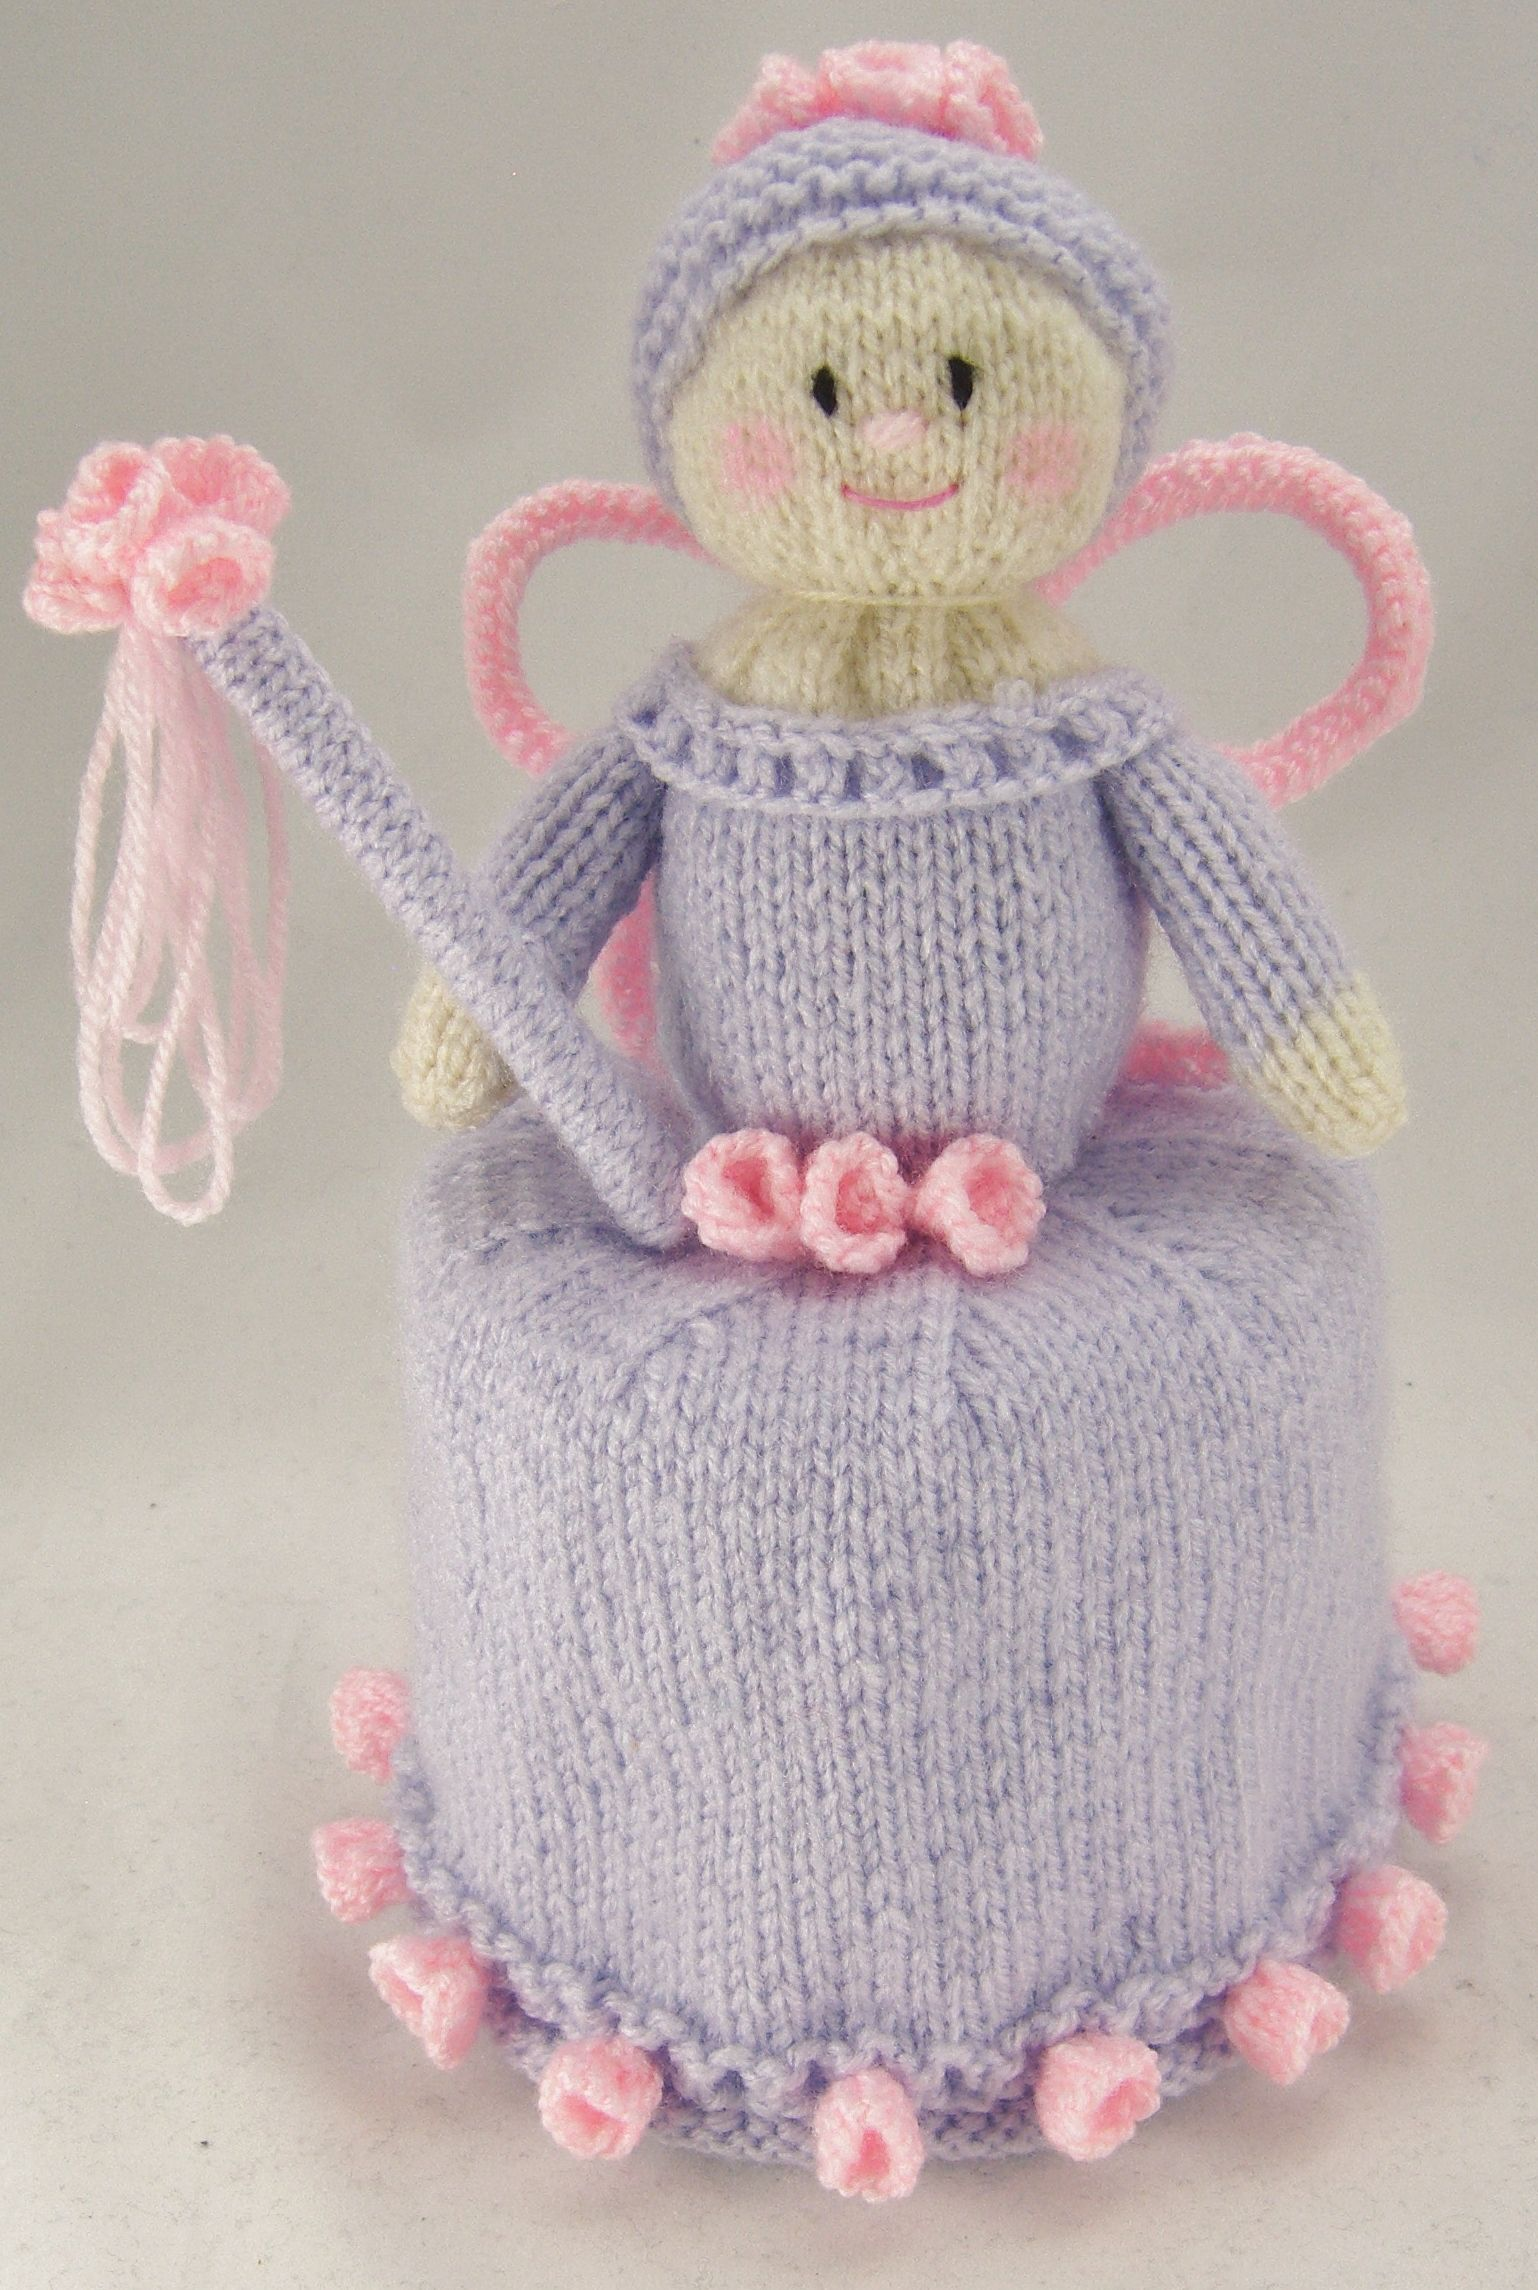 Flower Fairy Toilet Roll Cover Knitting Pattern | Klohut Puppe ...